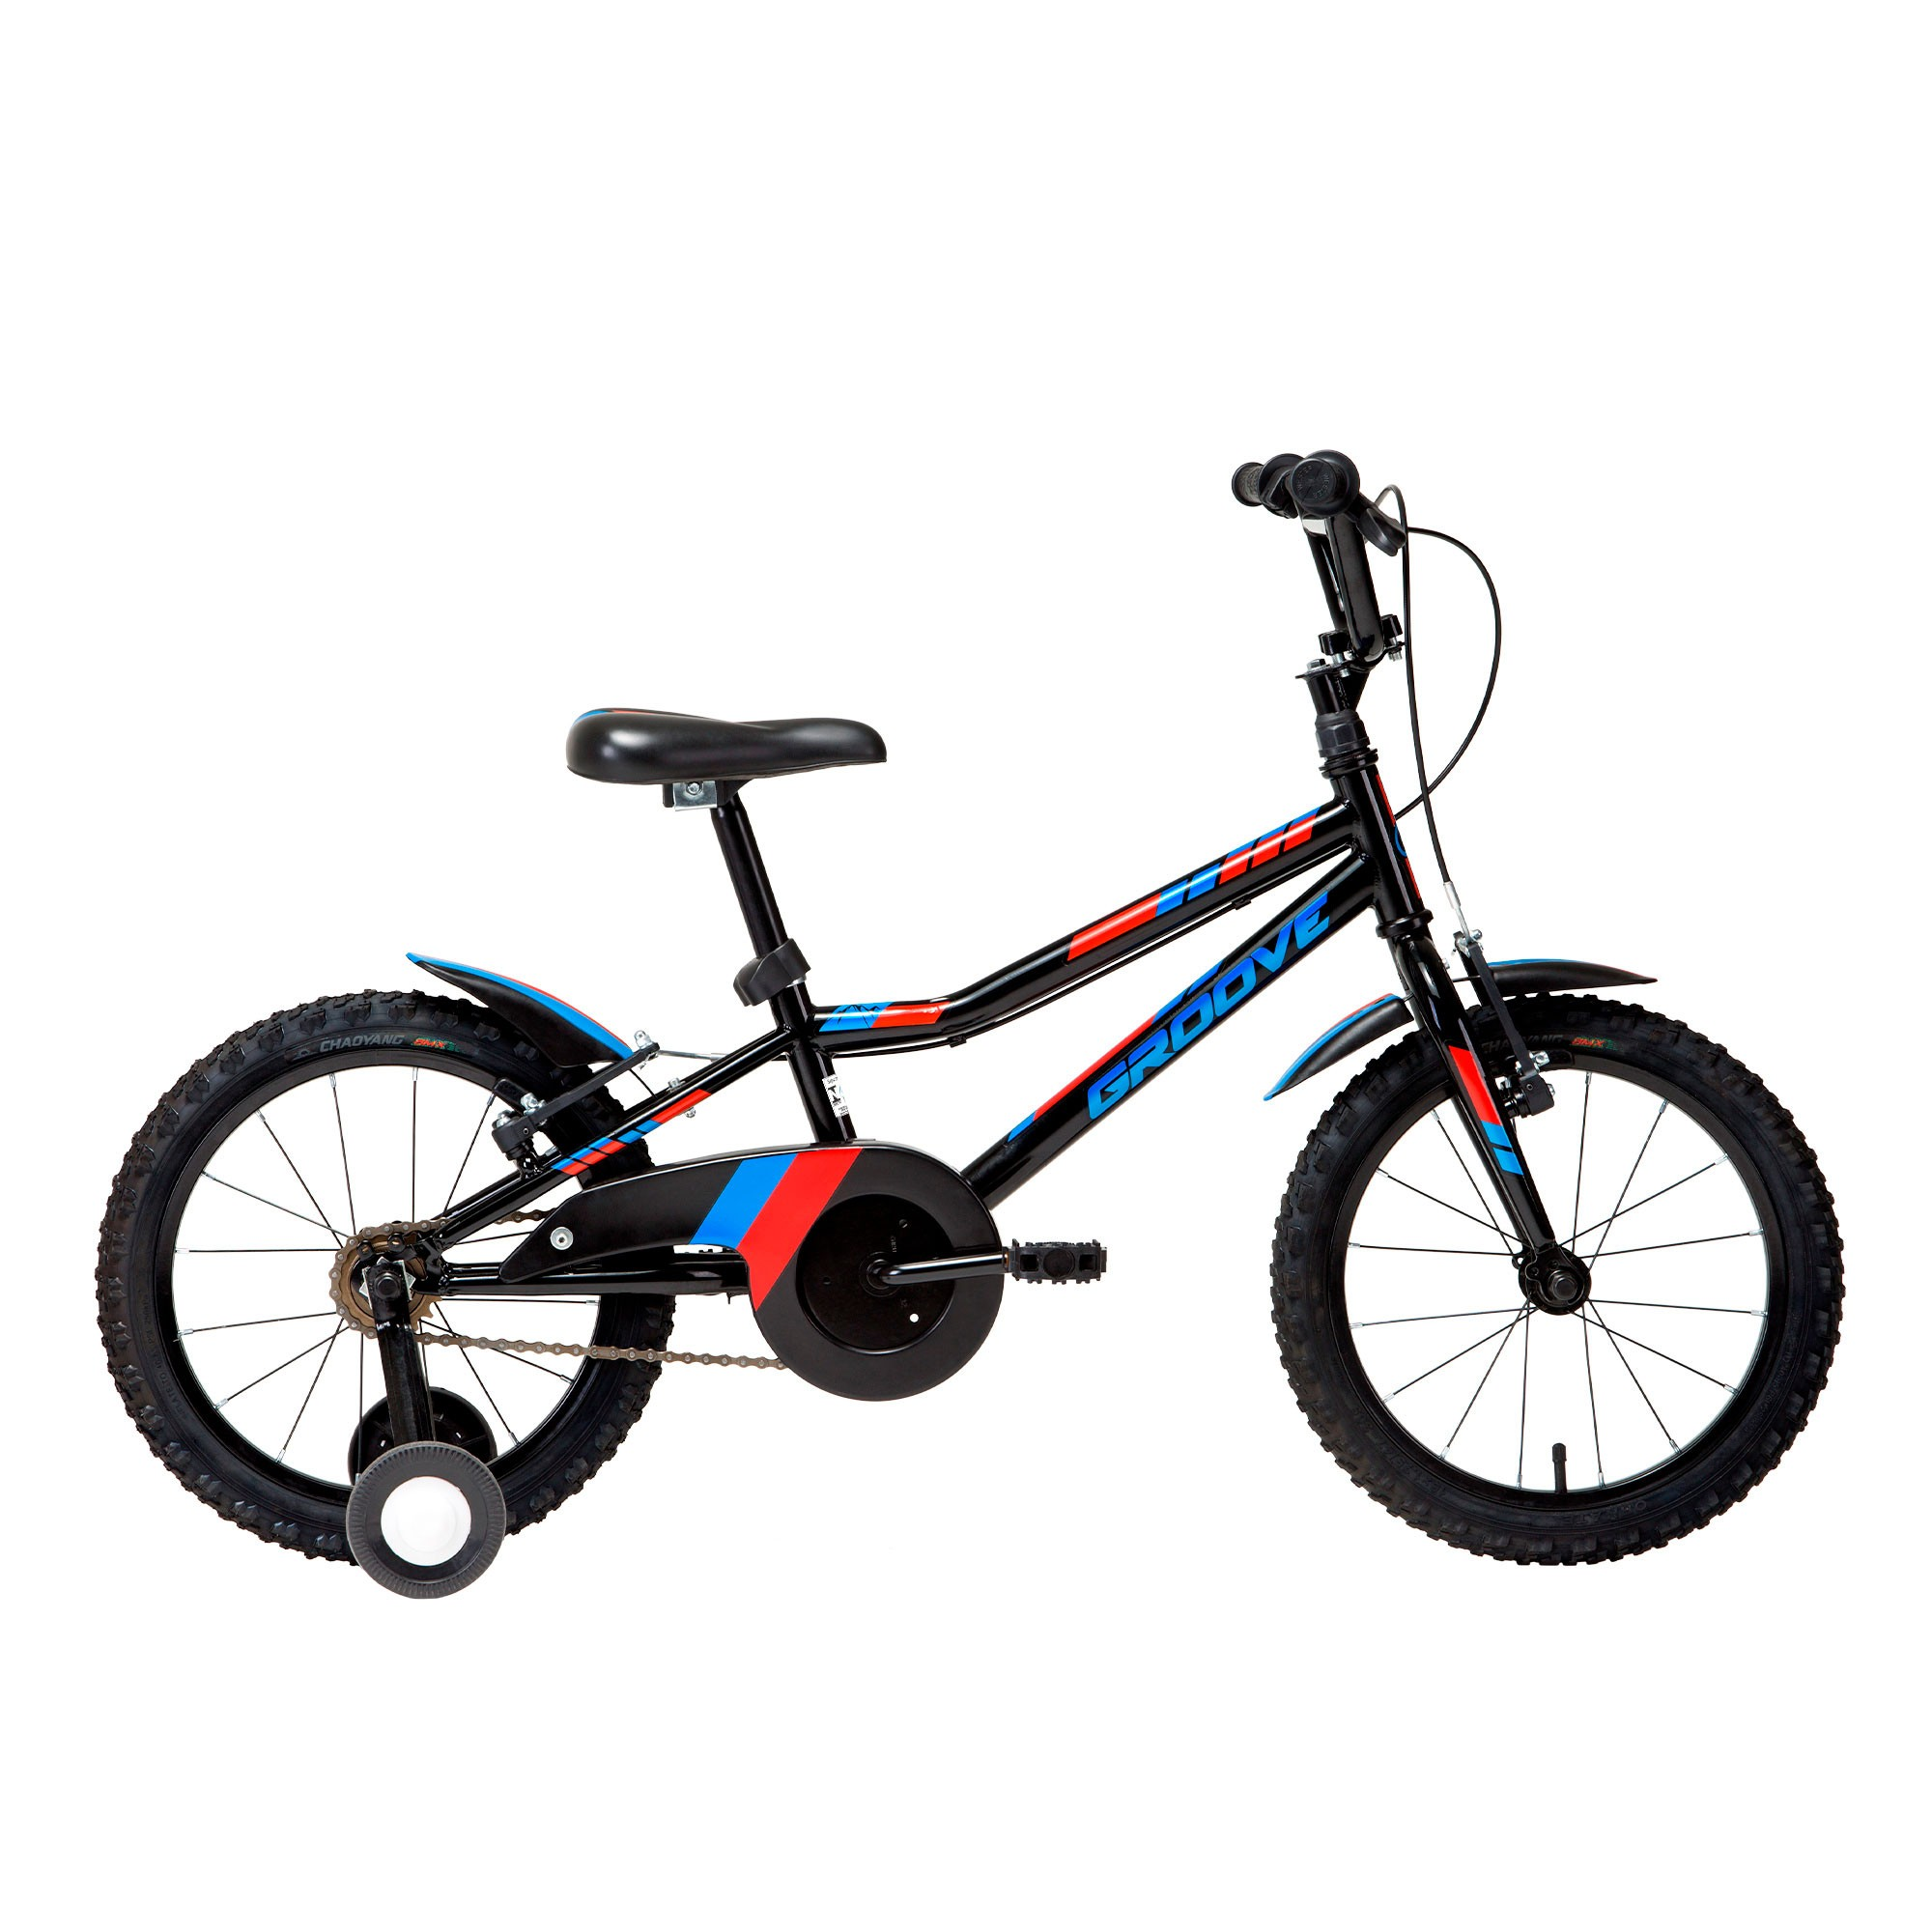 Bicicleta infantil Groove Ragga 16